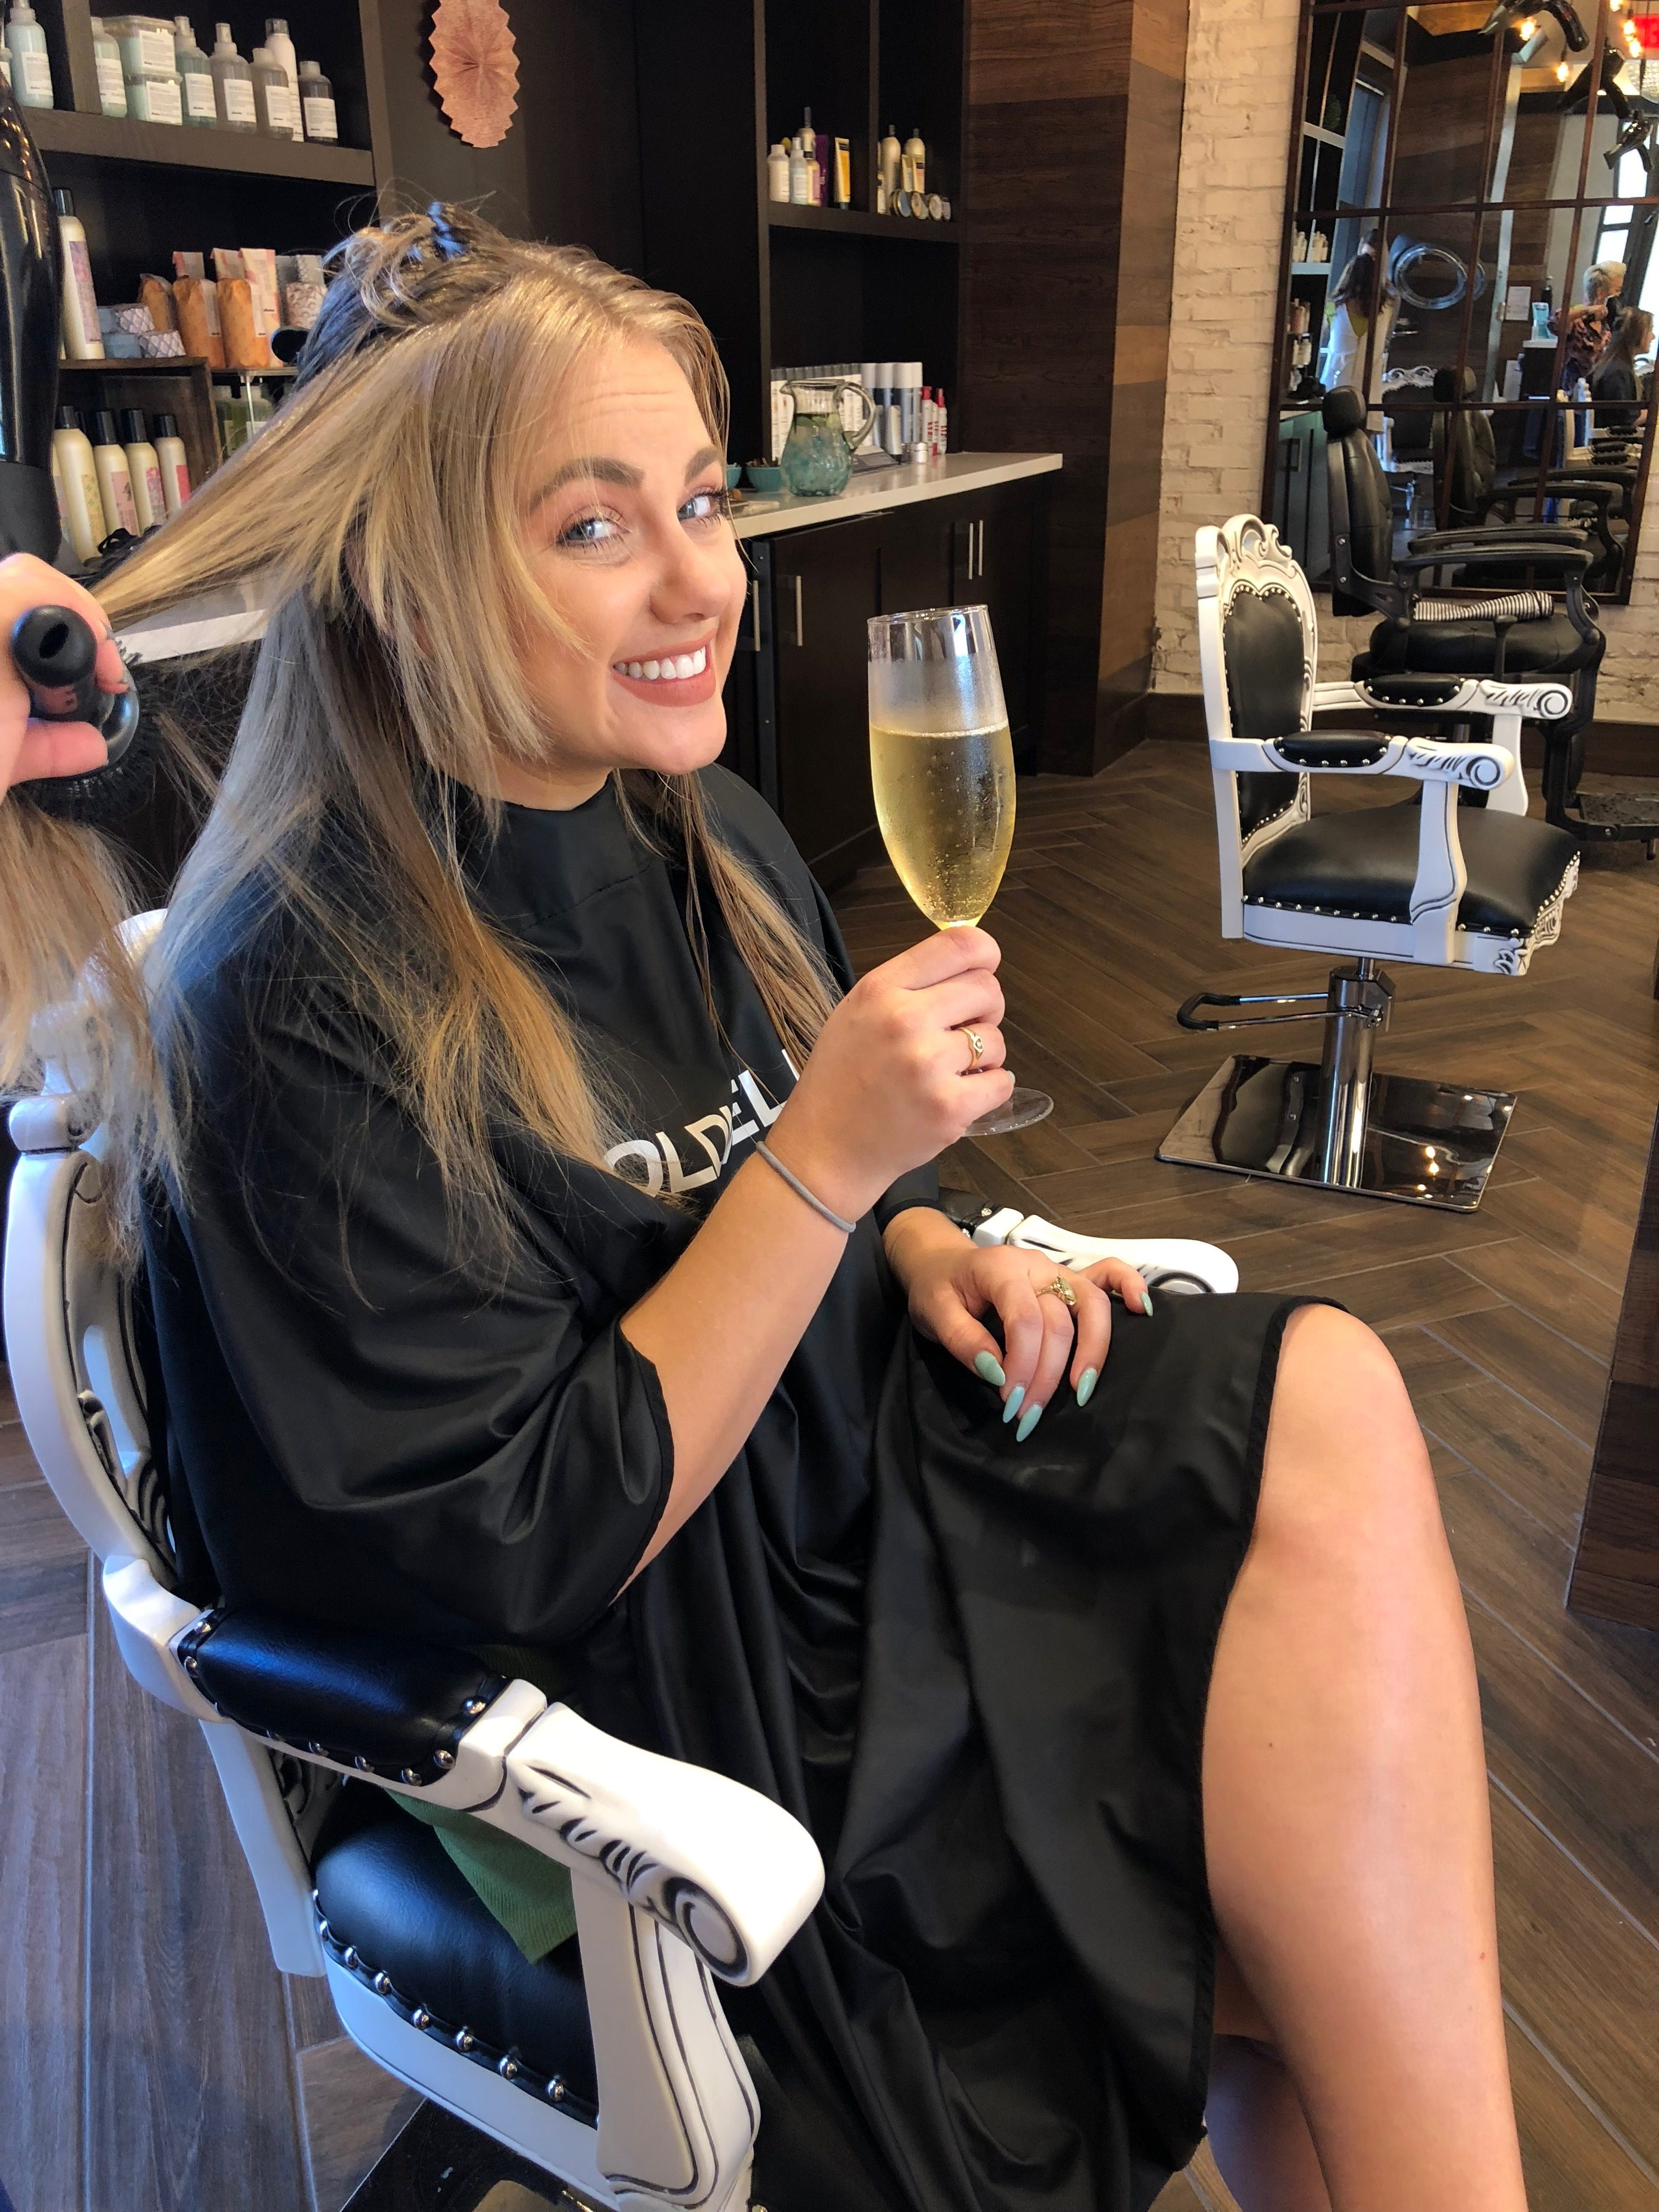 champagne at the hair salon